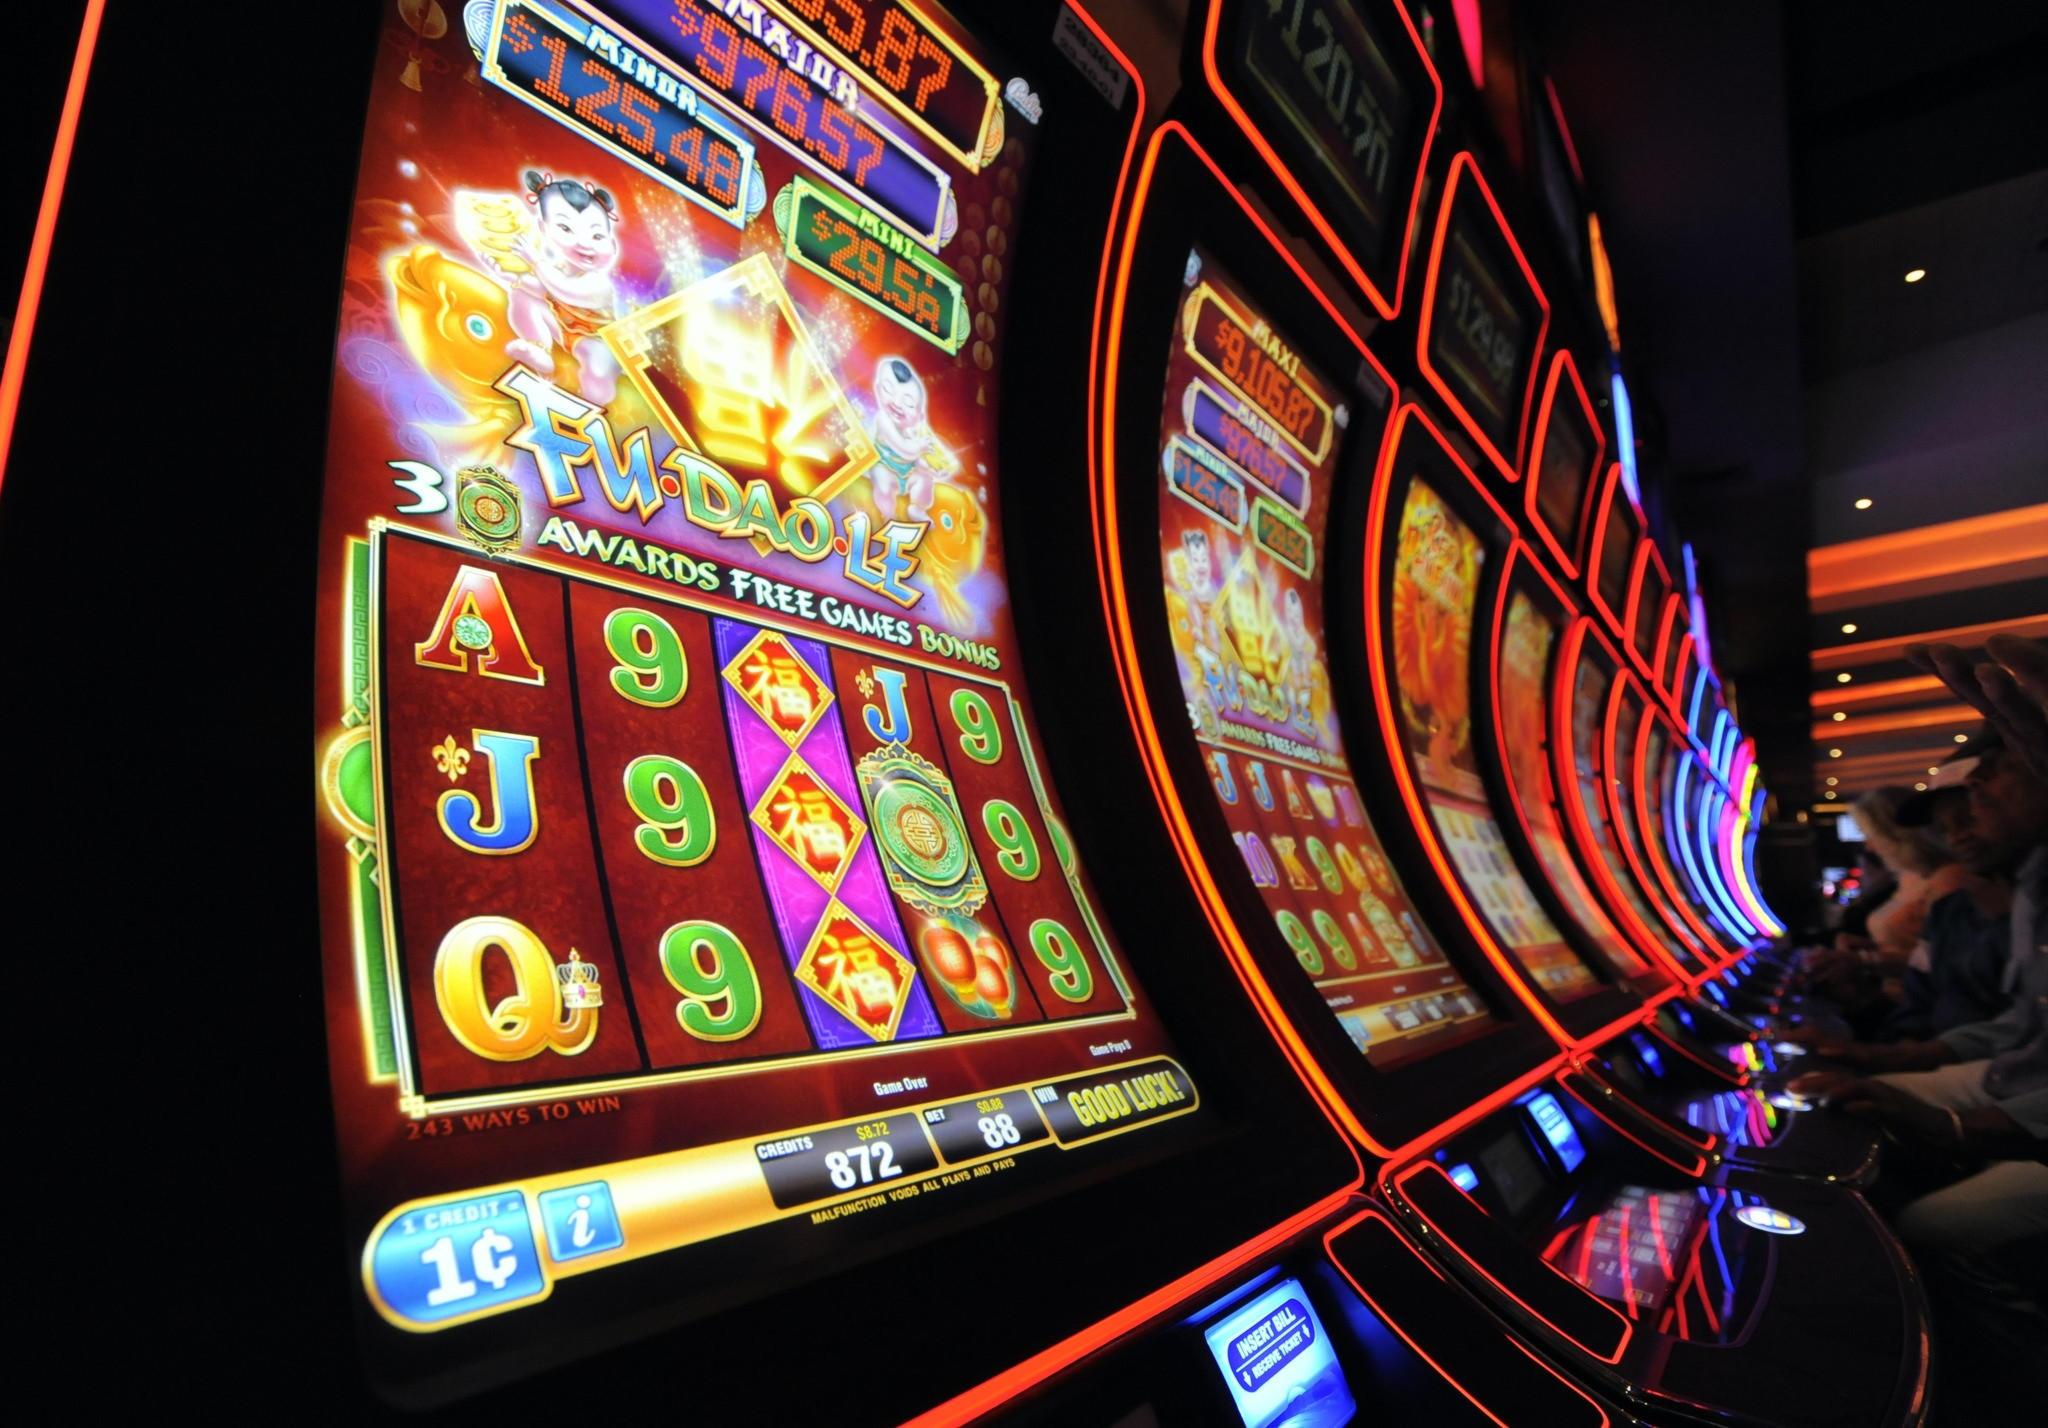 80 Free casino spins at Casino com